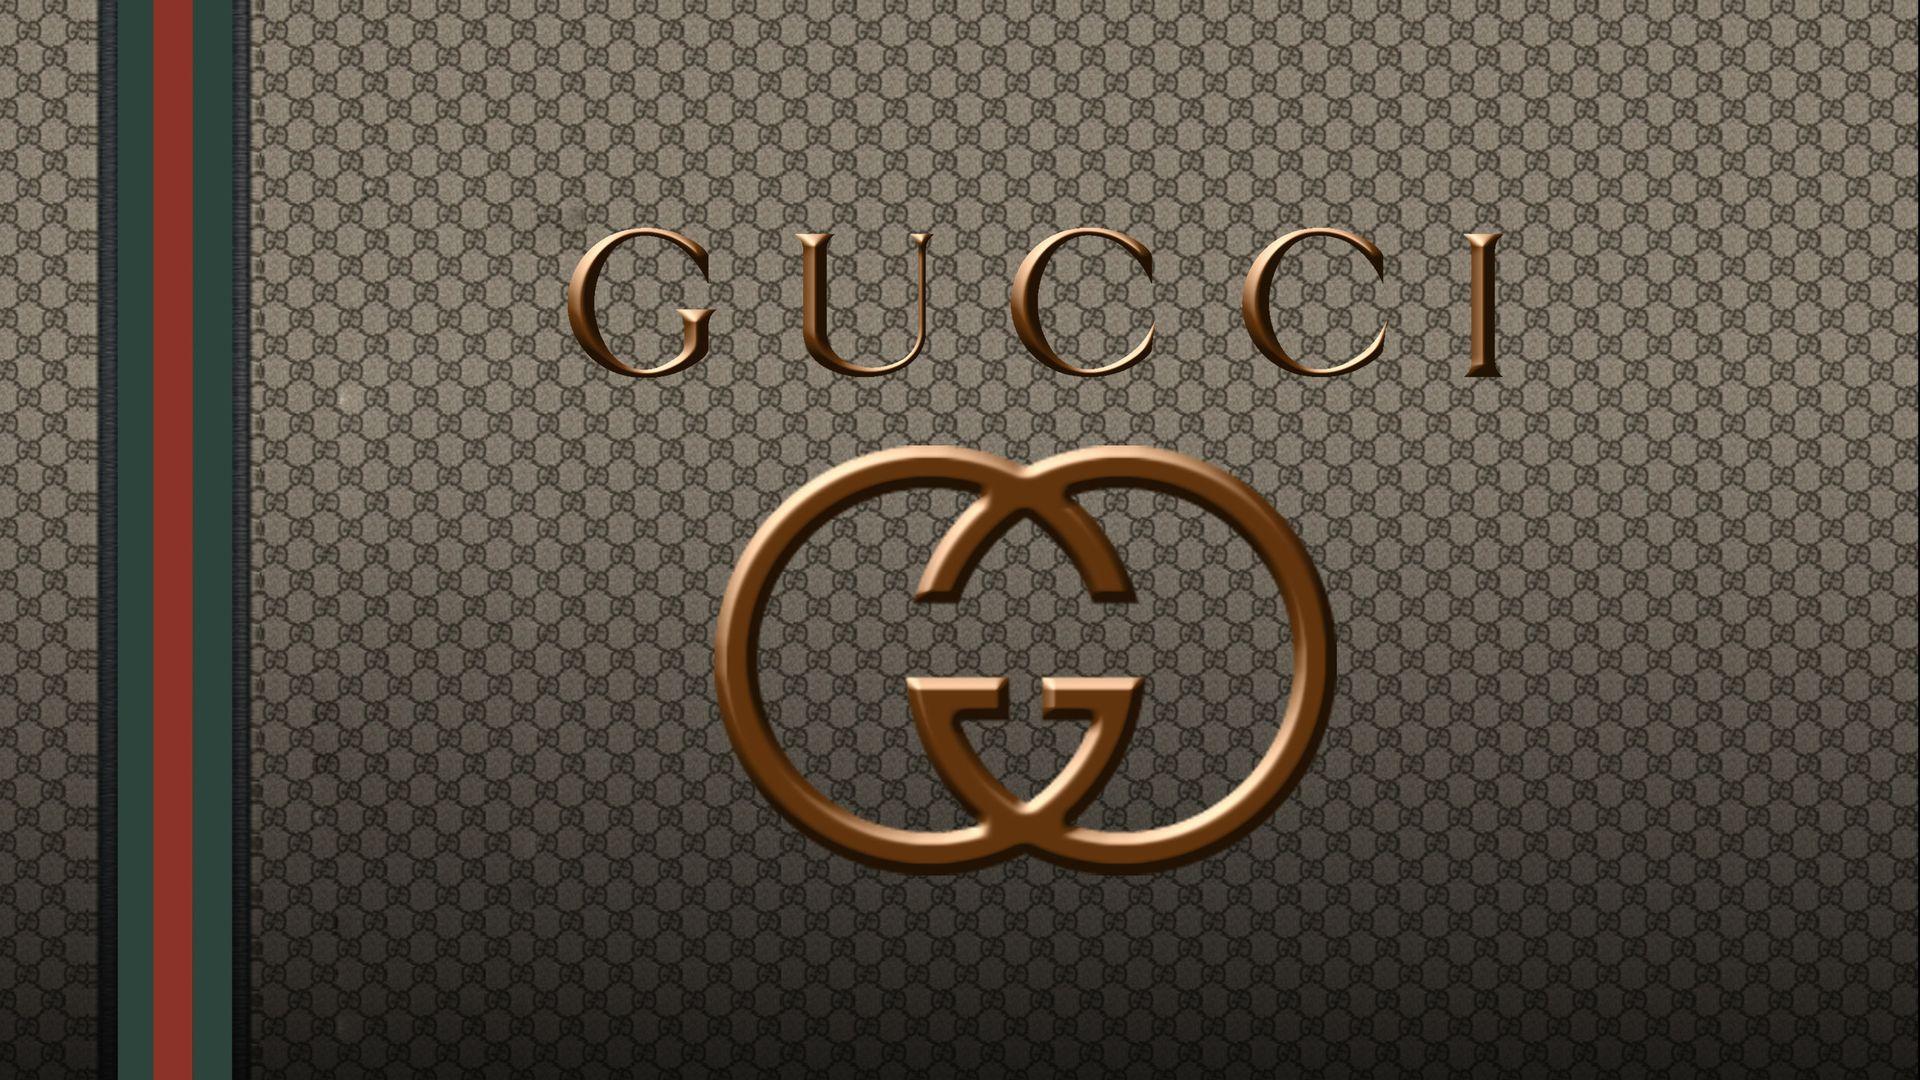 Gucci Car Logo Wallpaper   Wallpaper Stream 1920x1080